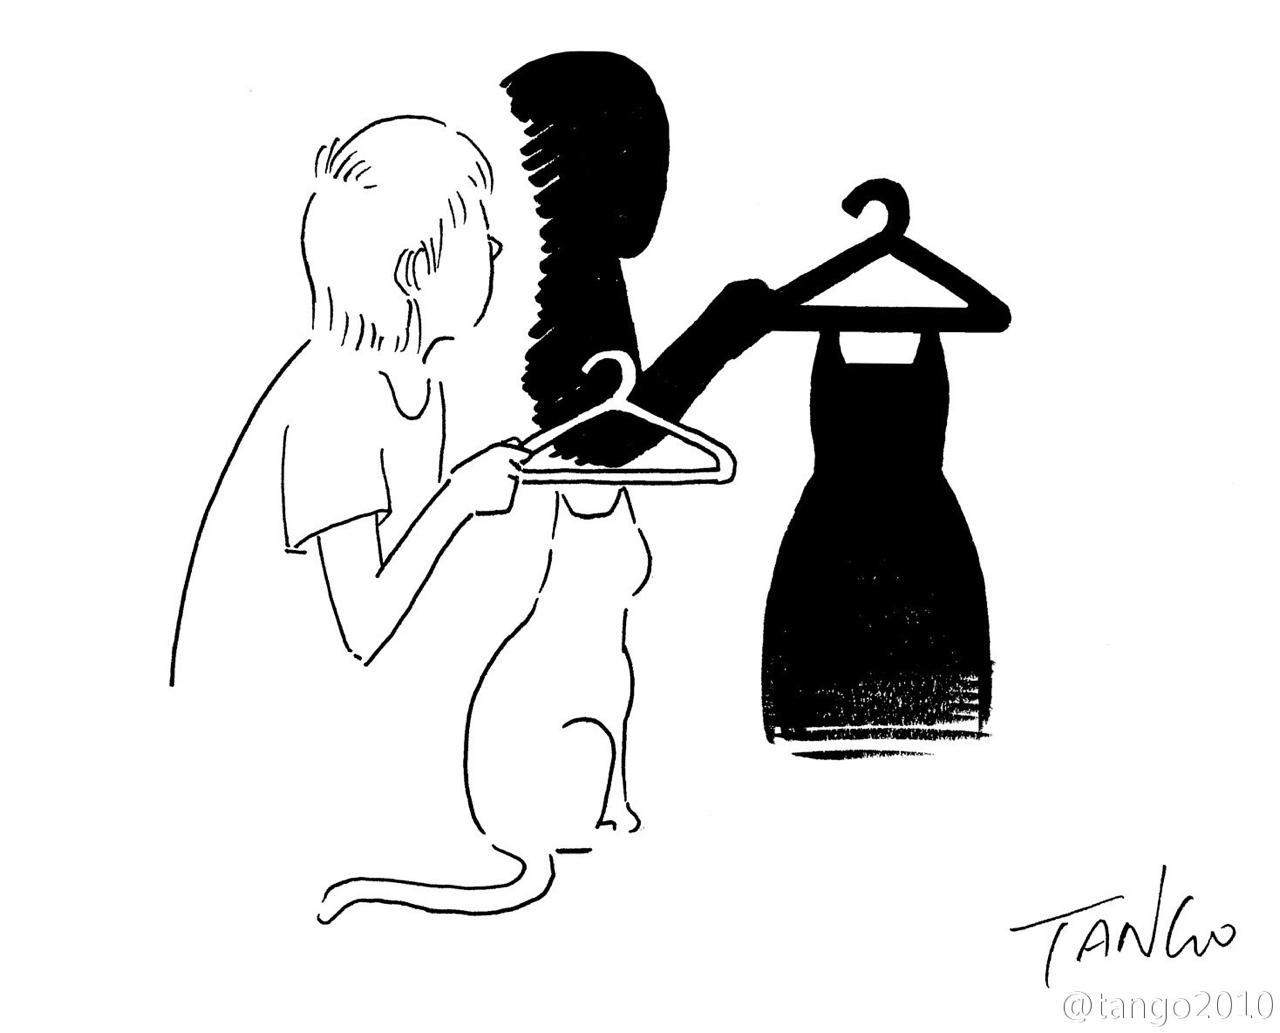 Shanghai Tango, Unique, Comics, cartoons, imagination, art